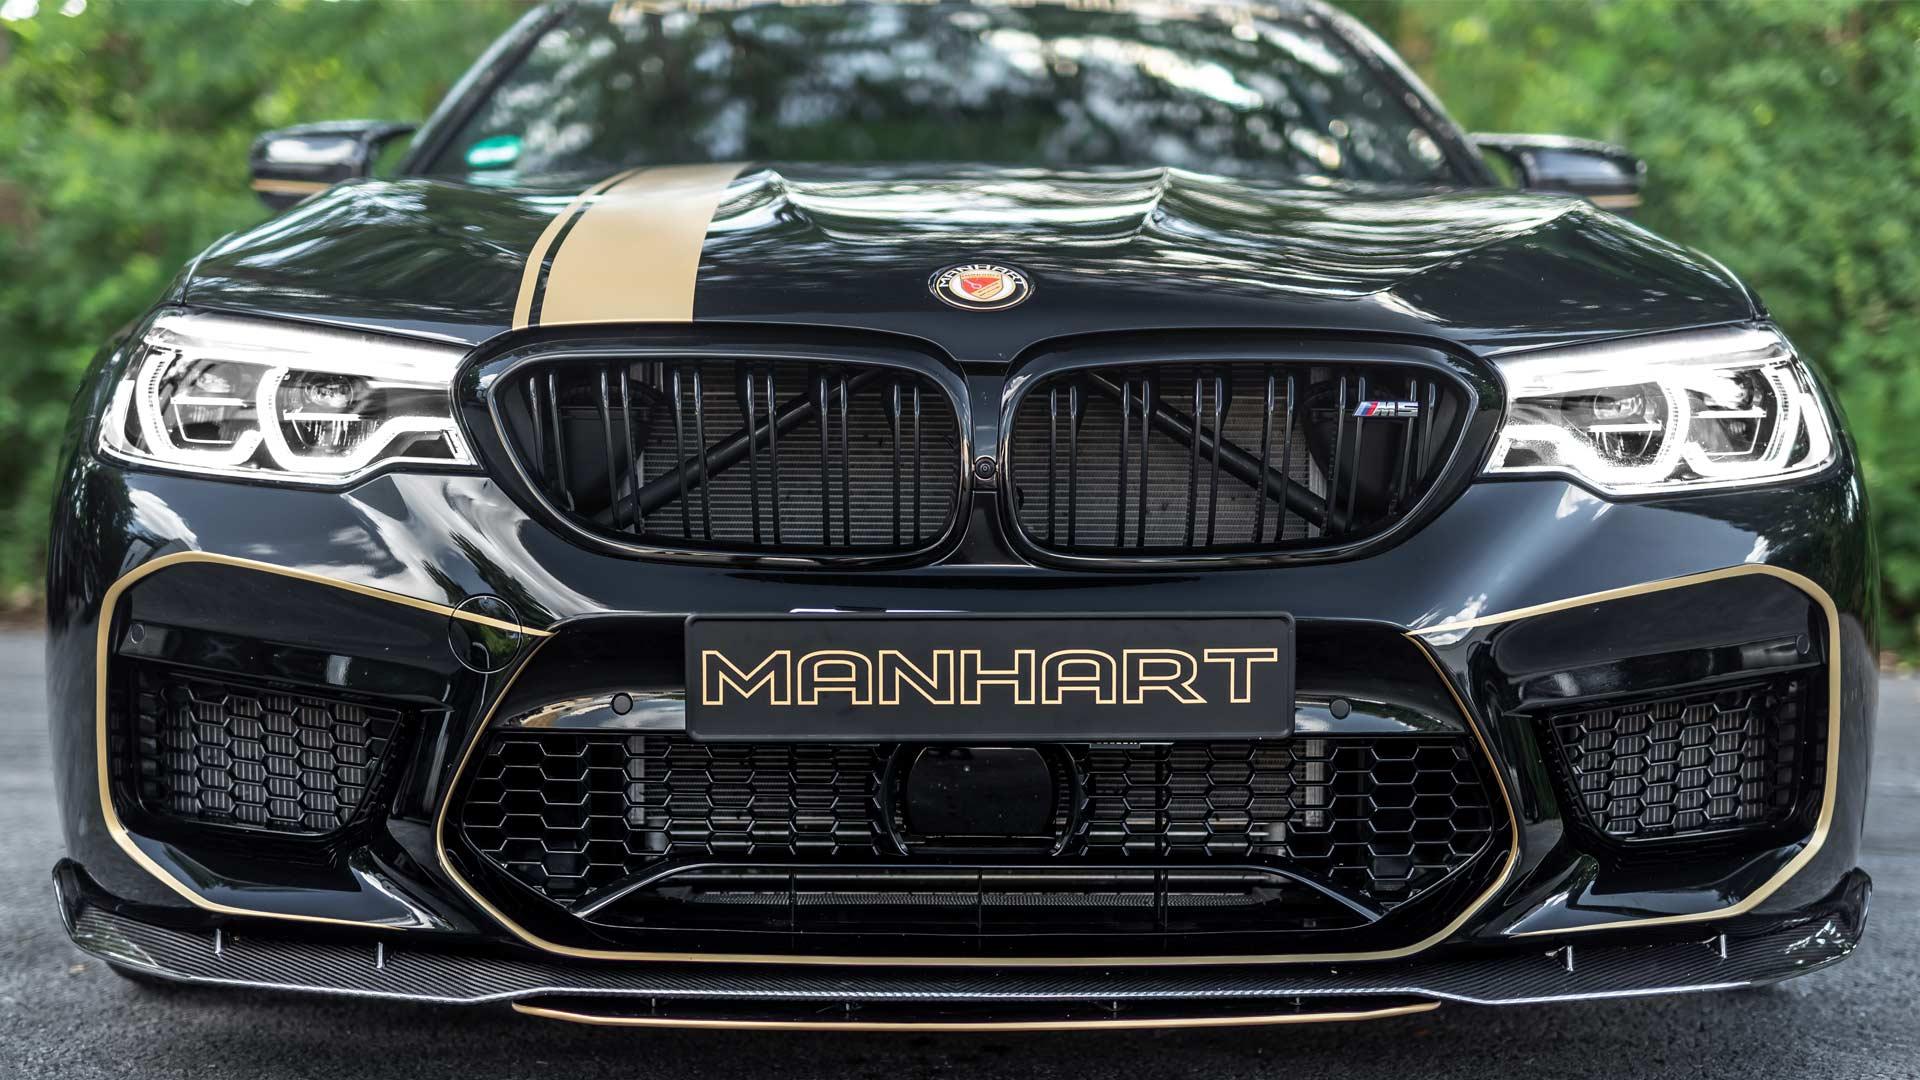 Manhart-MH5-700-2018-BMW-M5_7